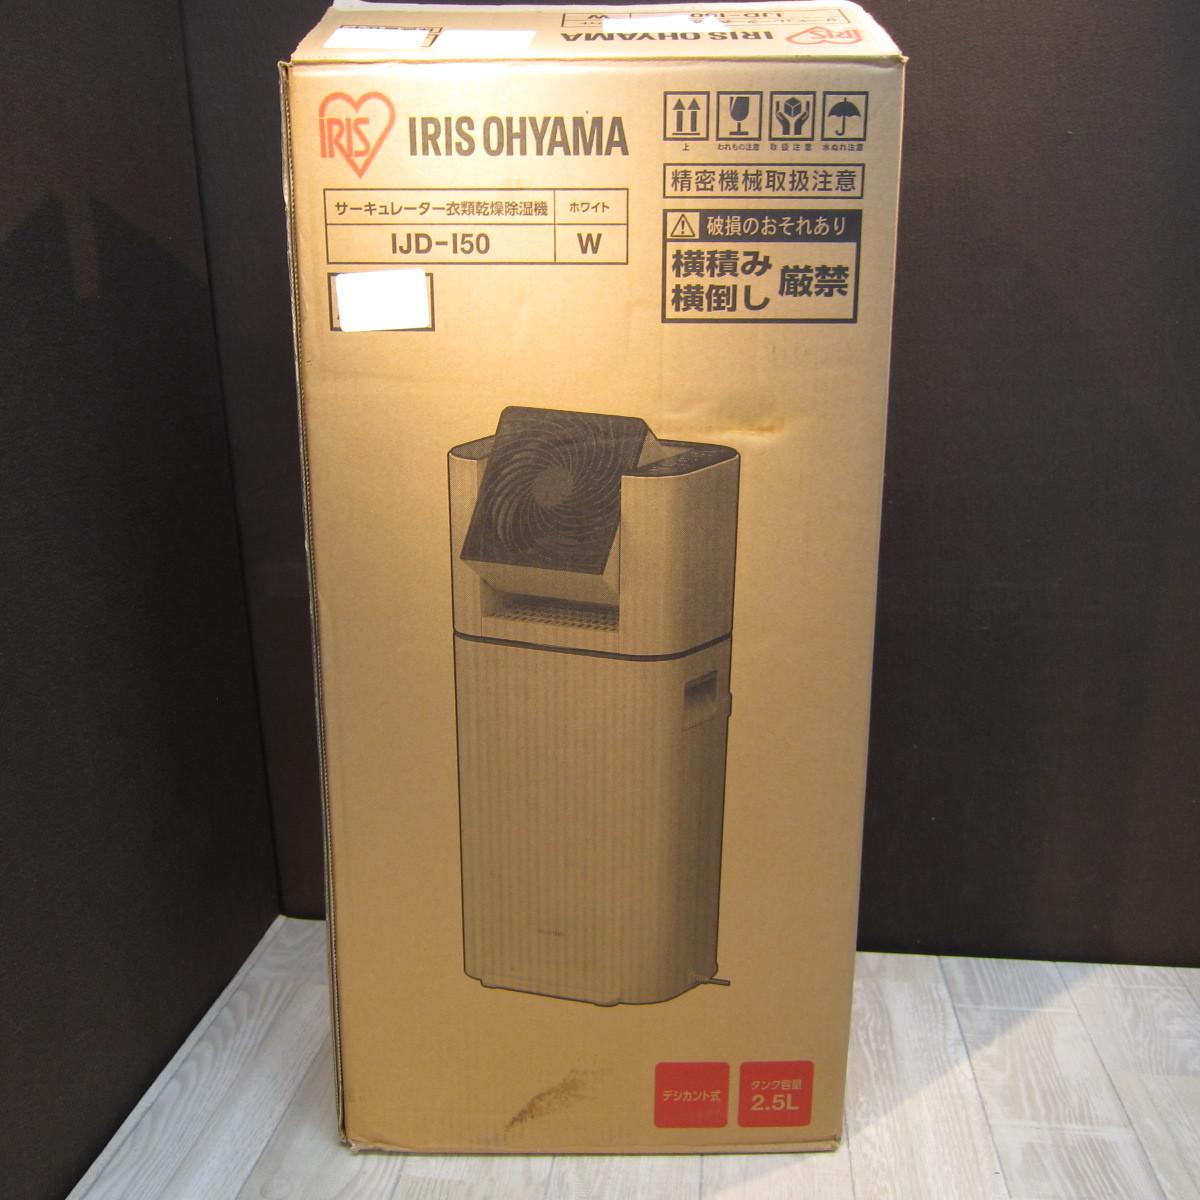 S6081【未使用】アイリスオーヤマ 衣類乾燥除湿機 スピード乾燥 サーキュレーター機能付 デシカント式 ホワイト IJD-I50_画像9